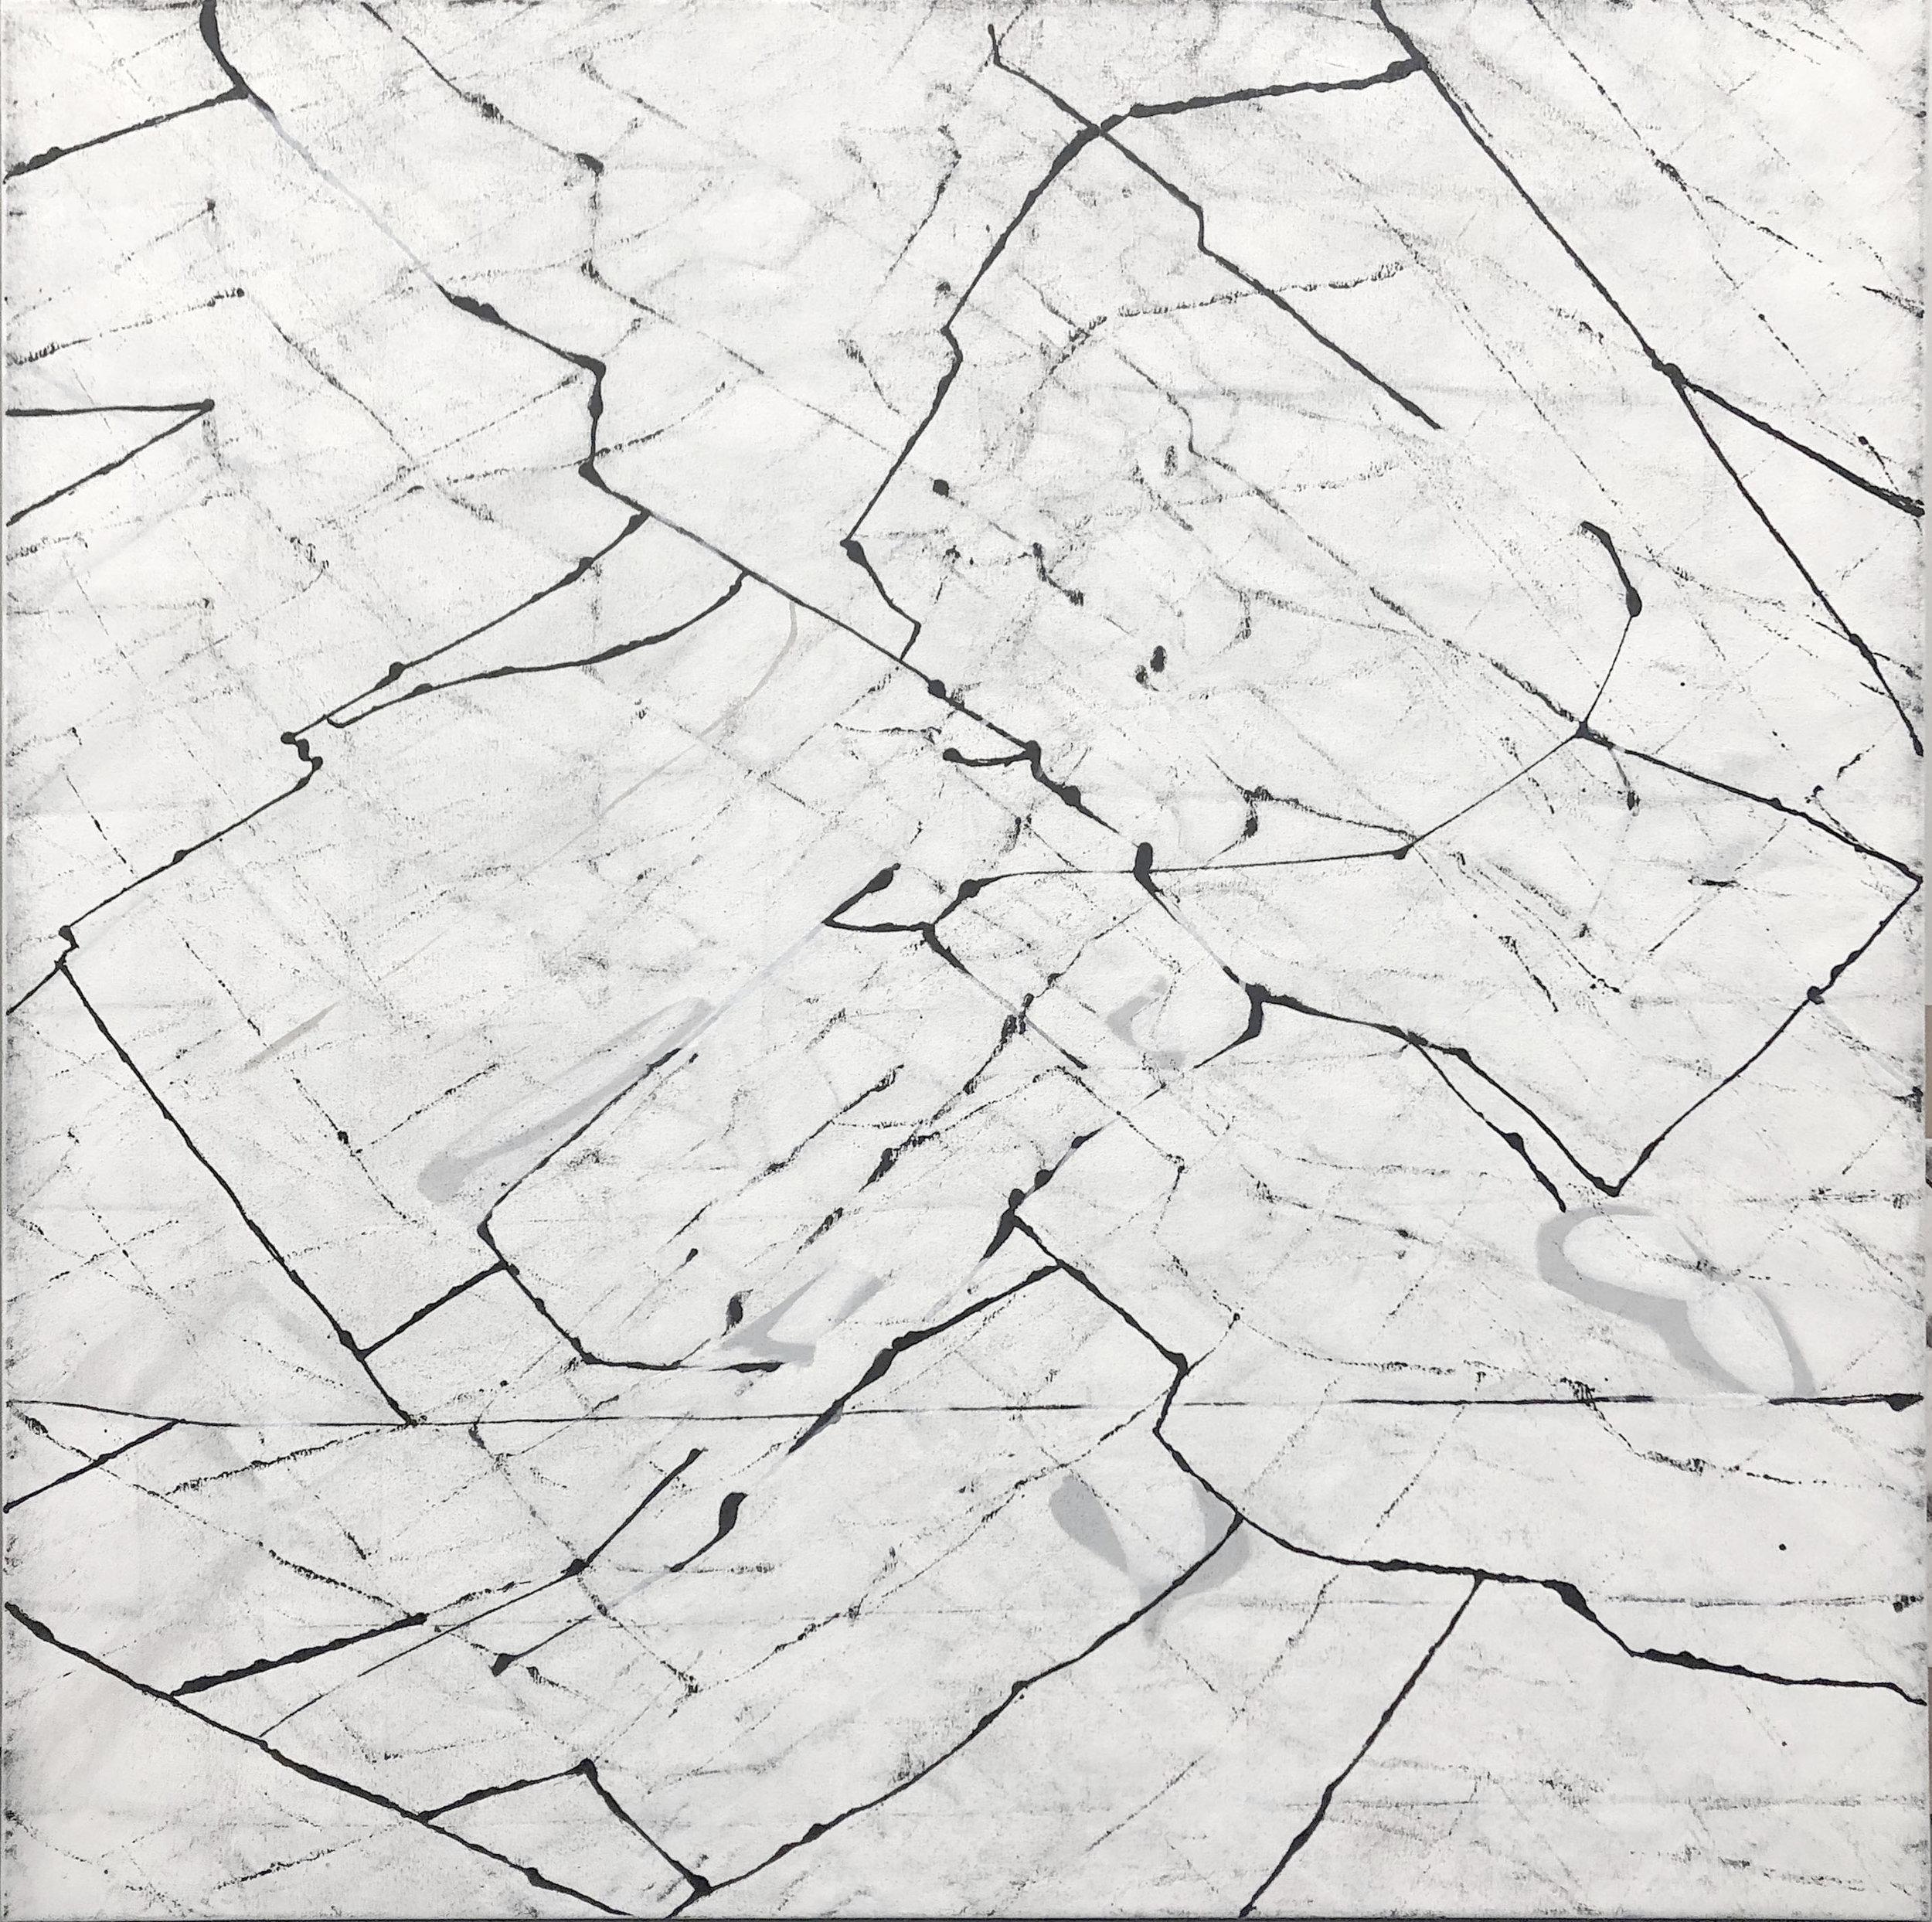 Furl, 36x36, Oil on Canvas